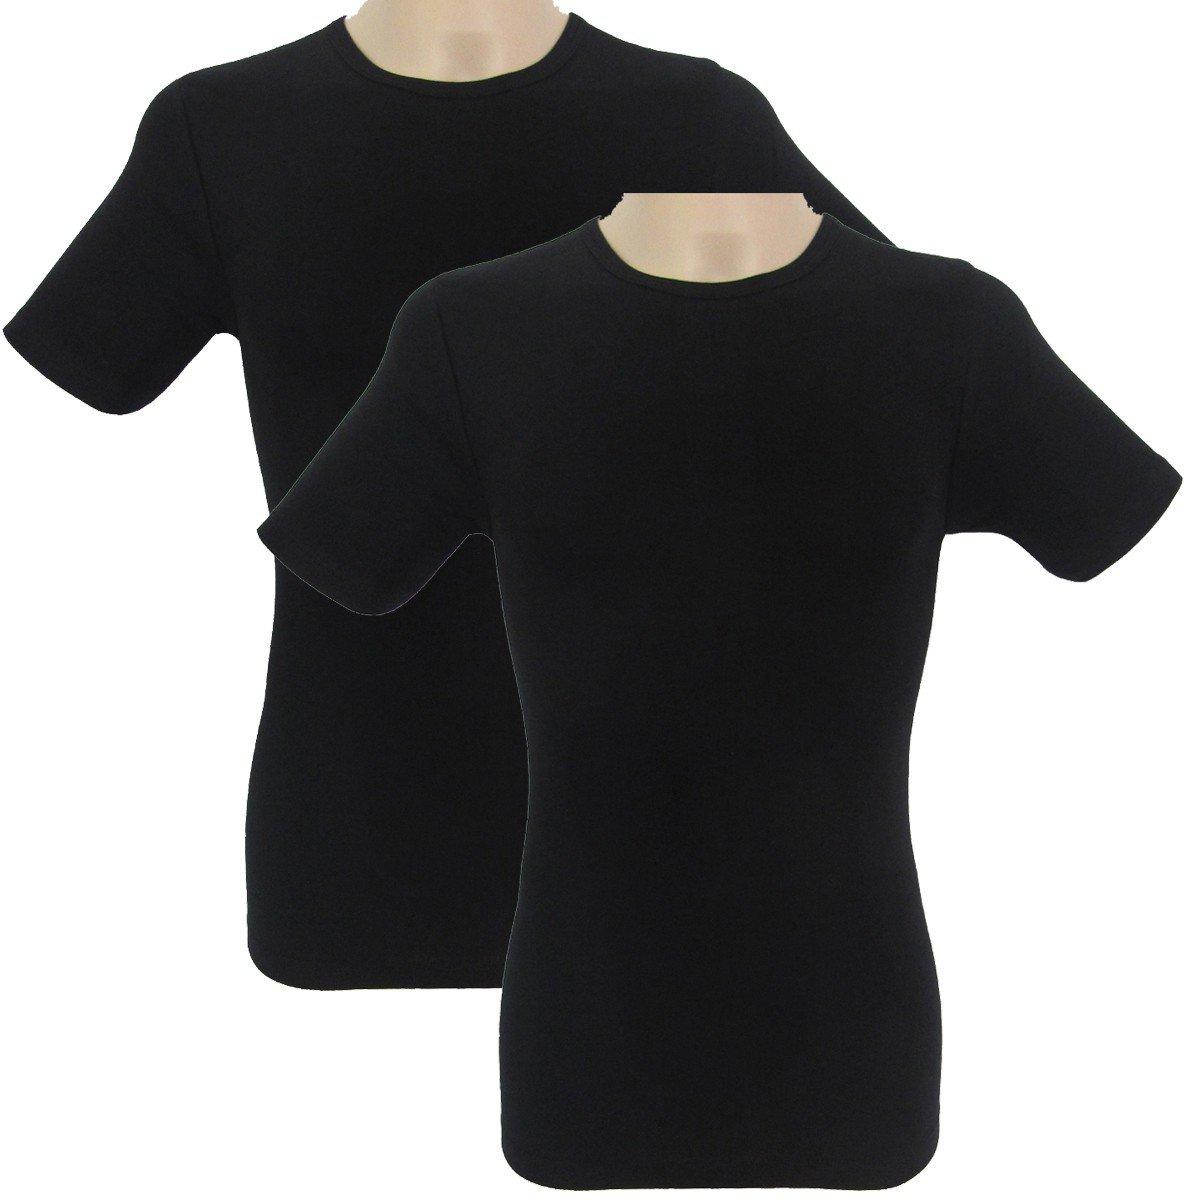 made of 100/% cotton HERMKO 3840-2 mens short-sleeve undershirt with crew neckline